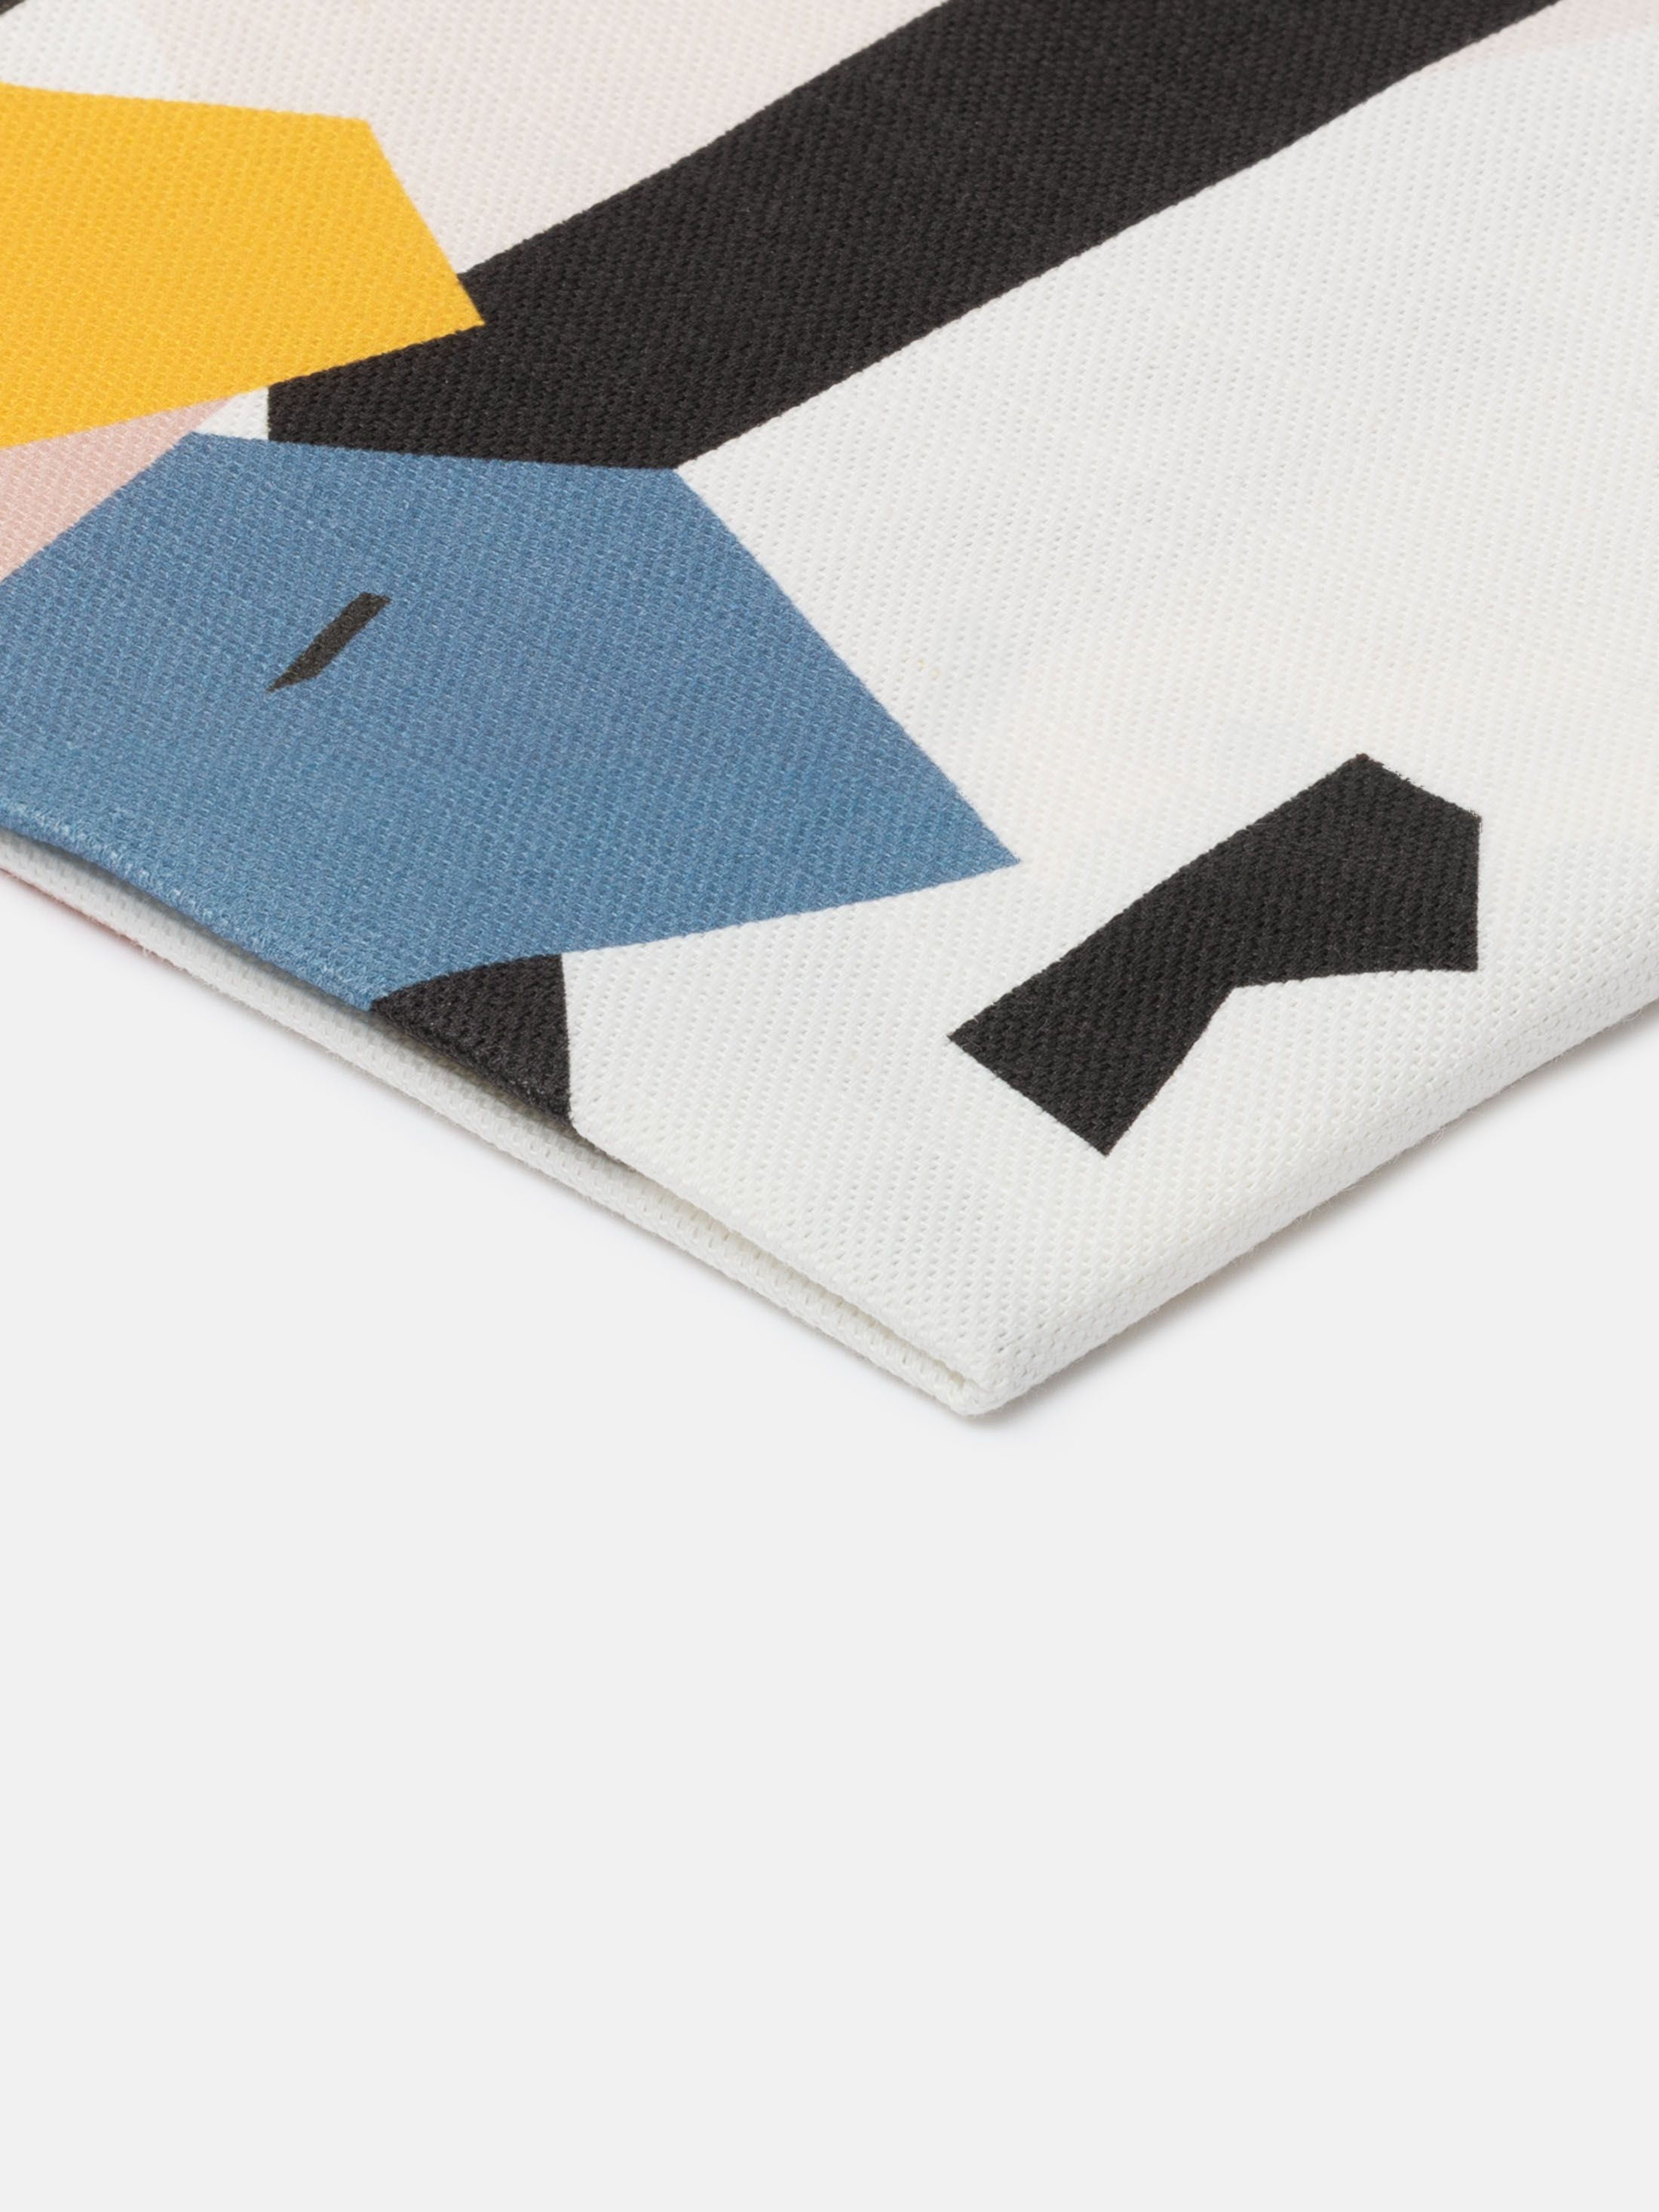 specialist tea towel printing